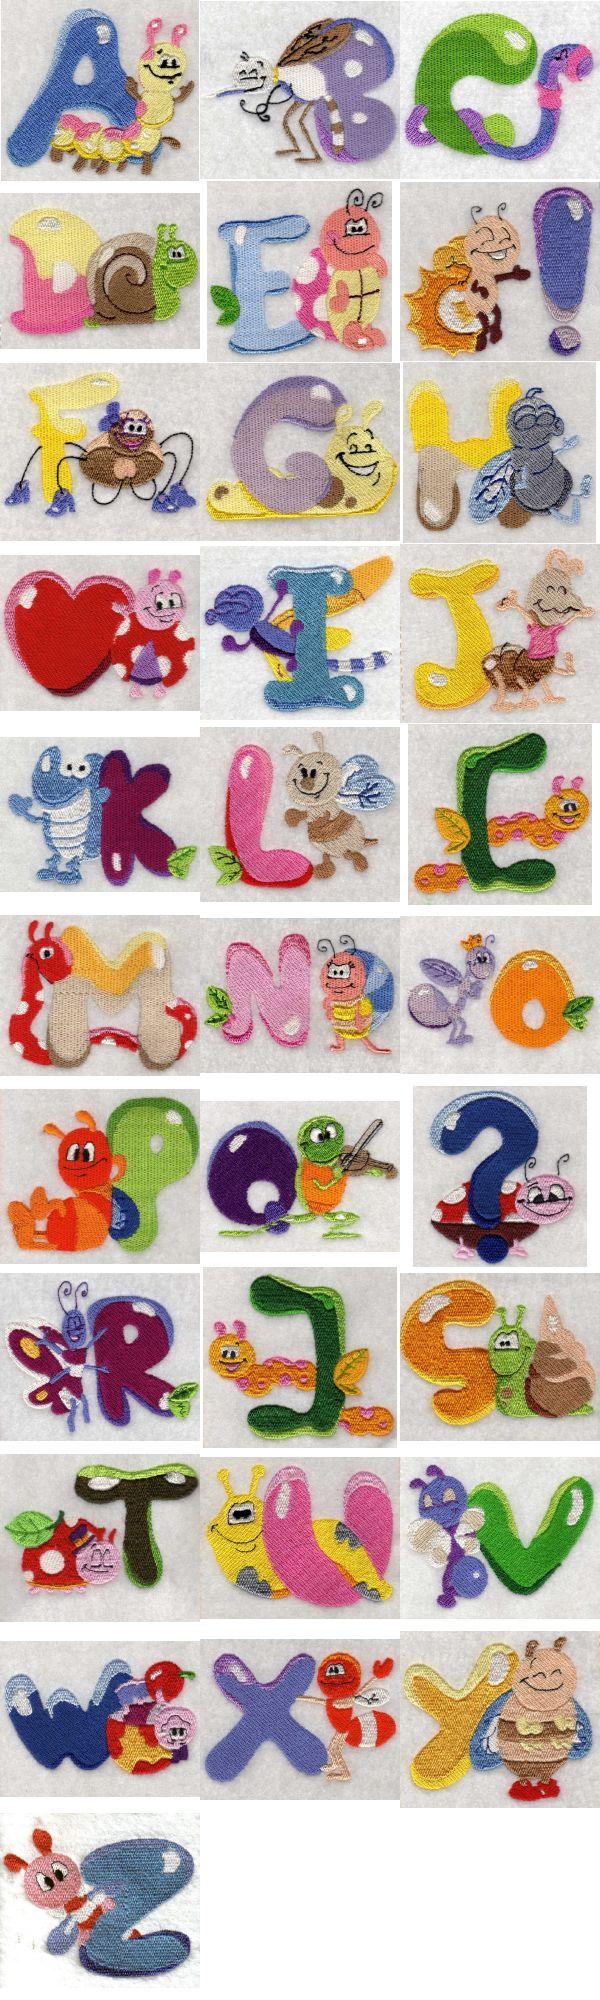 Machine embroidery designs bug alphabet set